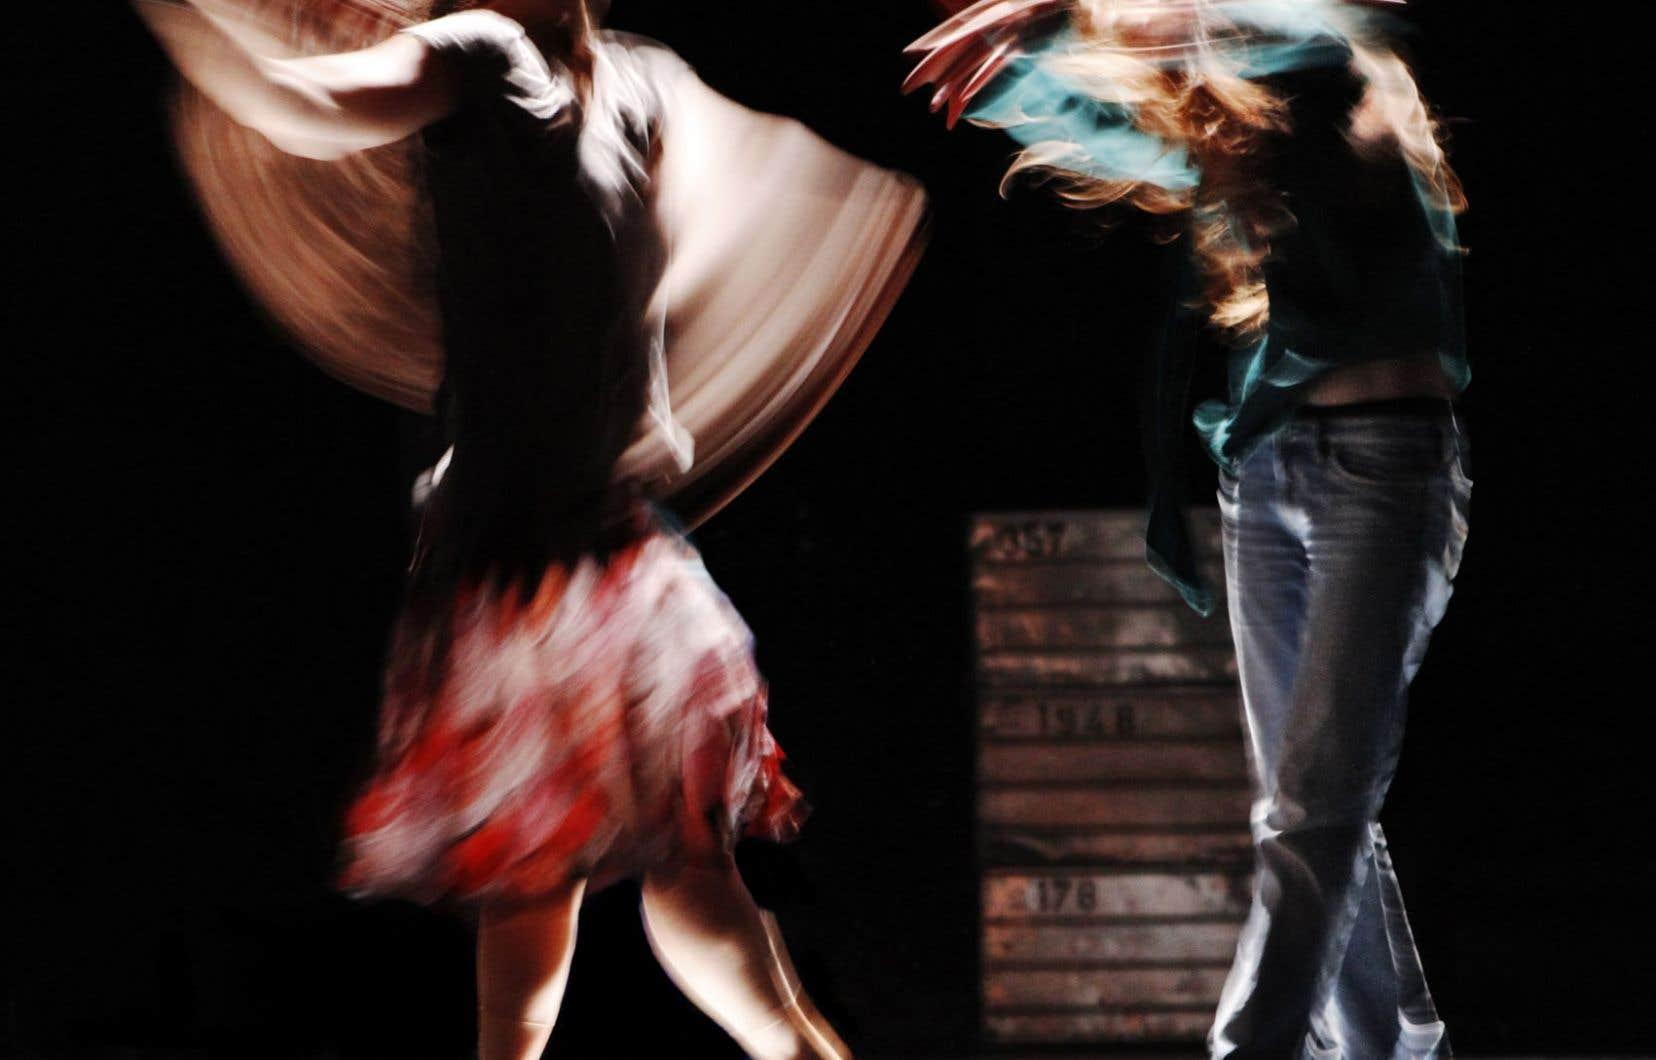 La danse-th&eacute;&acirc;tre <em>Trust</em>, en mai 2011